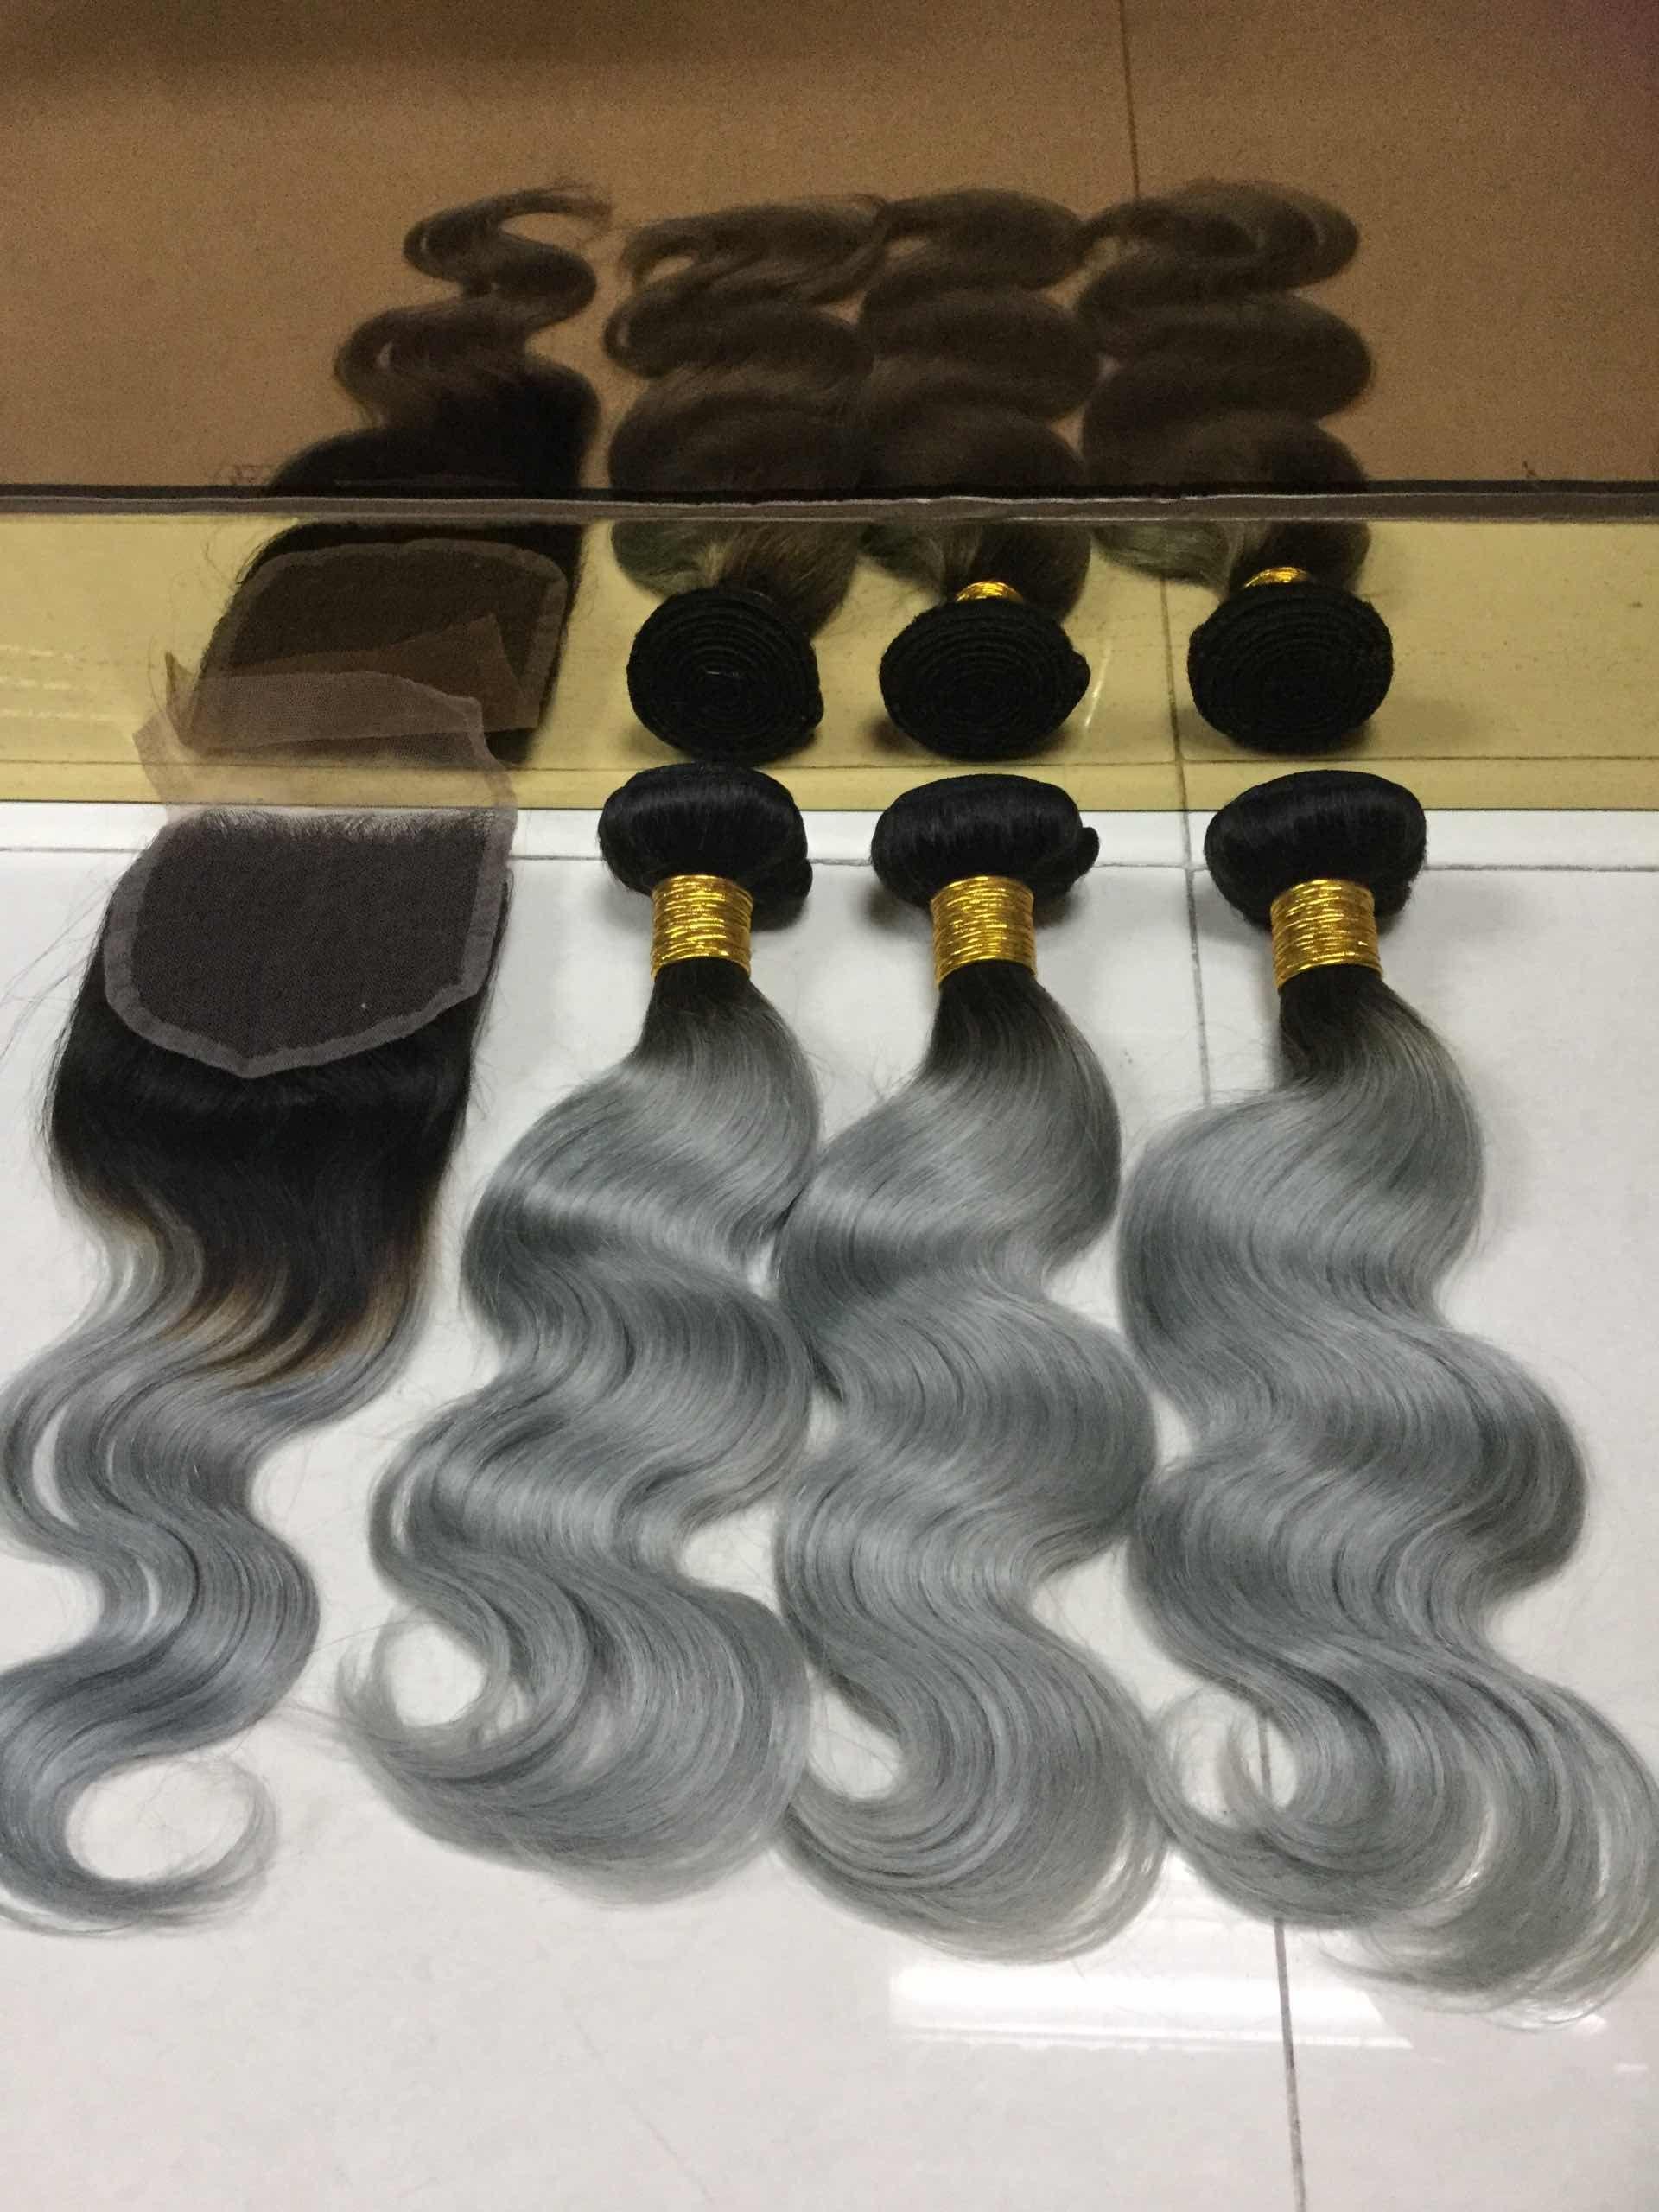 Sew In Human Hair Weave Ombre Hairgrey Human Hair Weavingcan Be